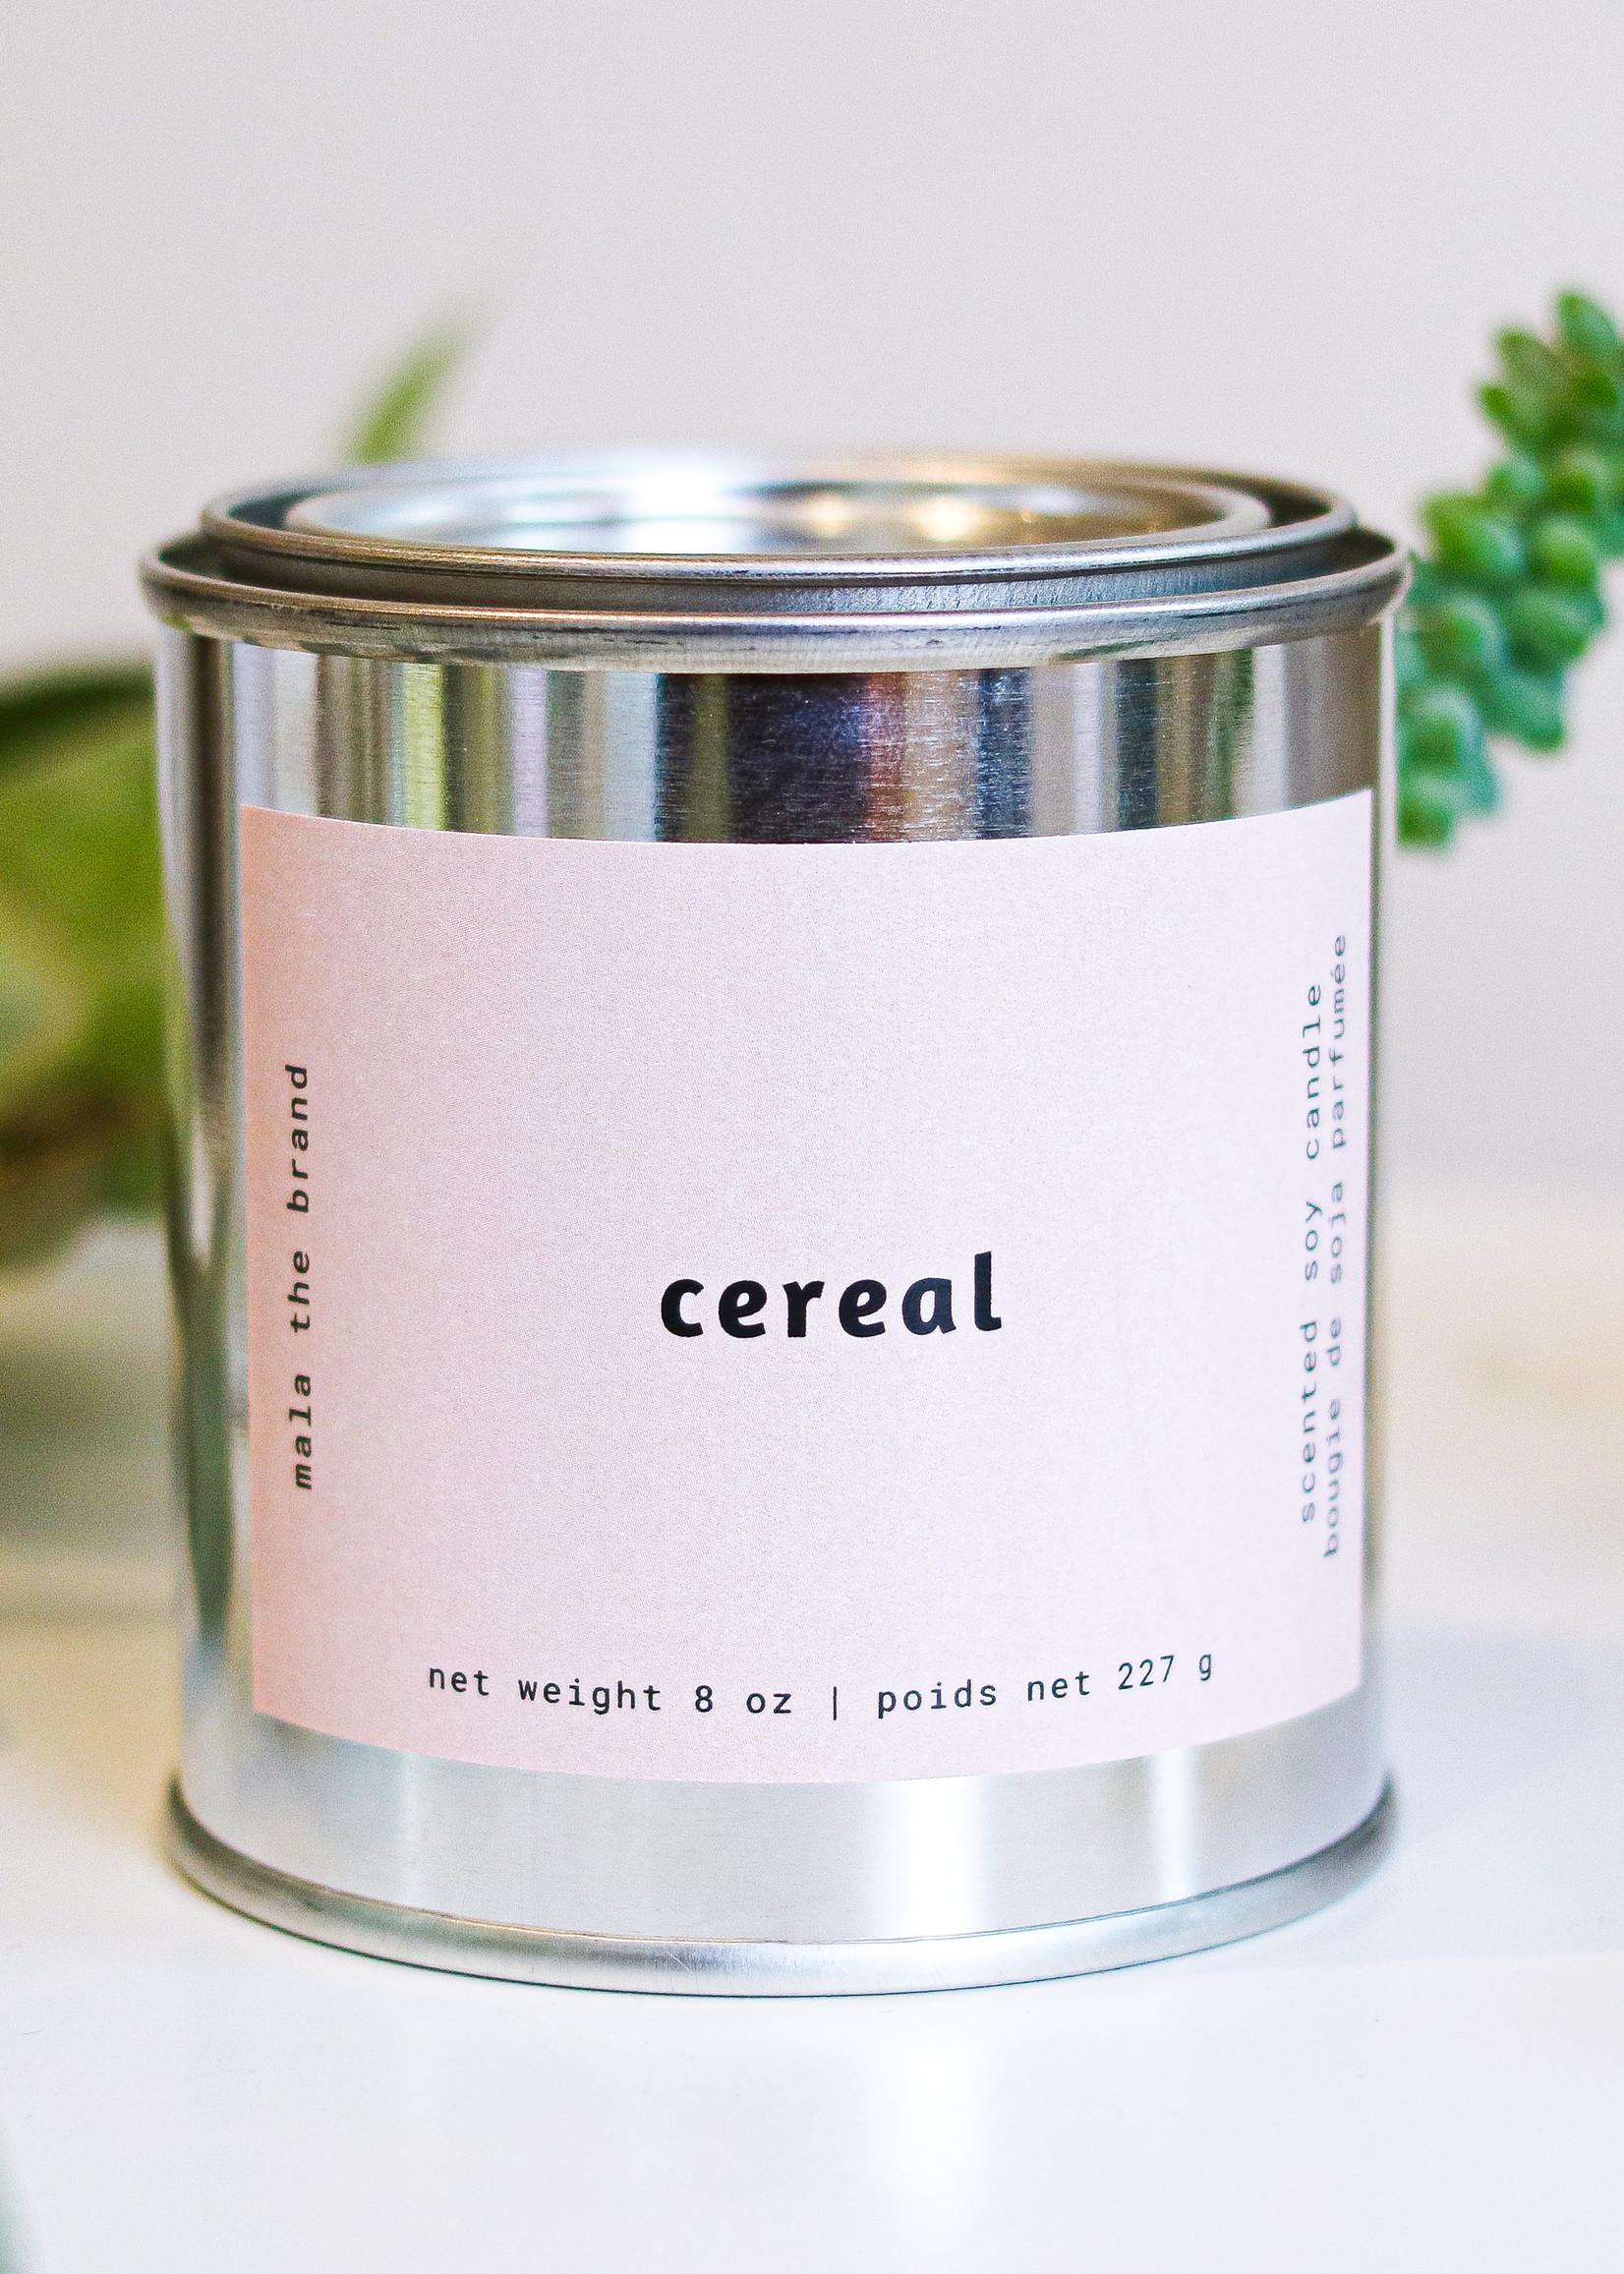 Mala Brand Mala - Cereal Candle